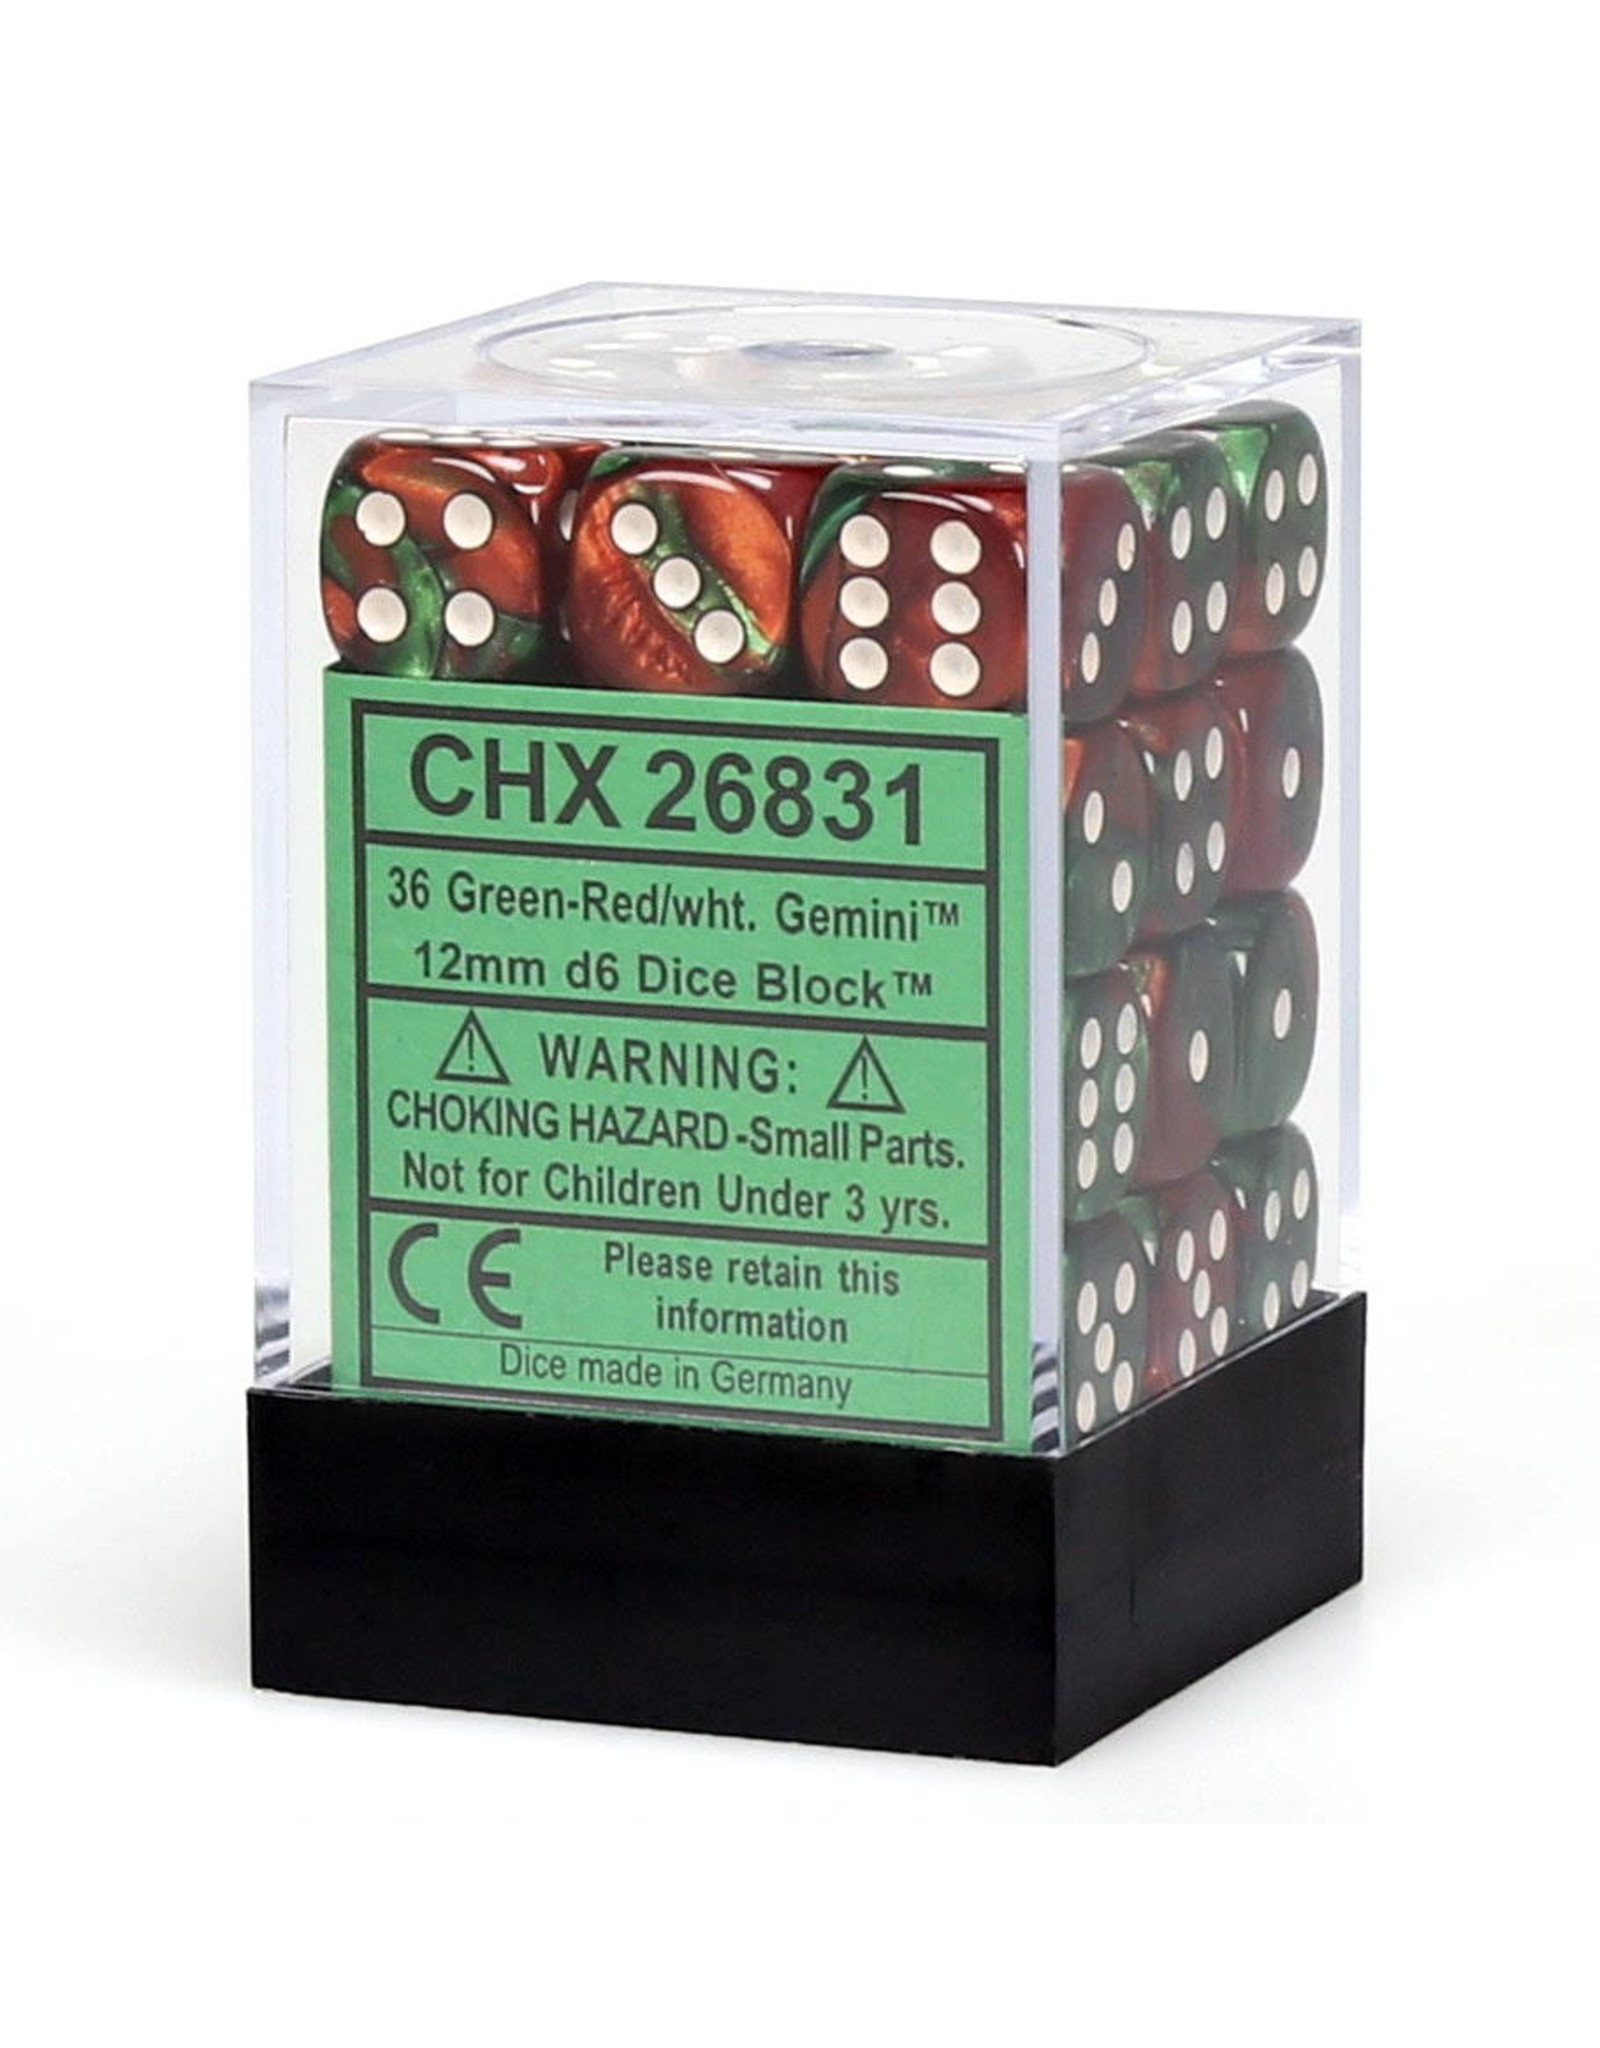 CHESSEX CHX 26831 12MM D6 DICE BLOCK GEMINI GREEN RED W/ WHITE